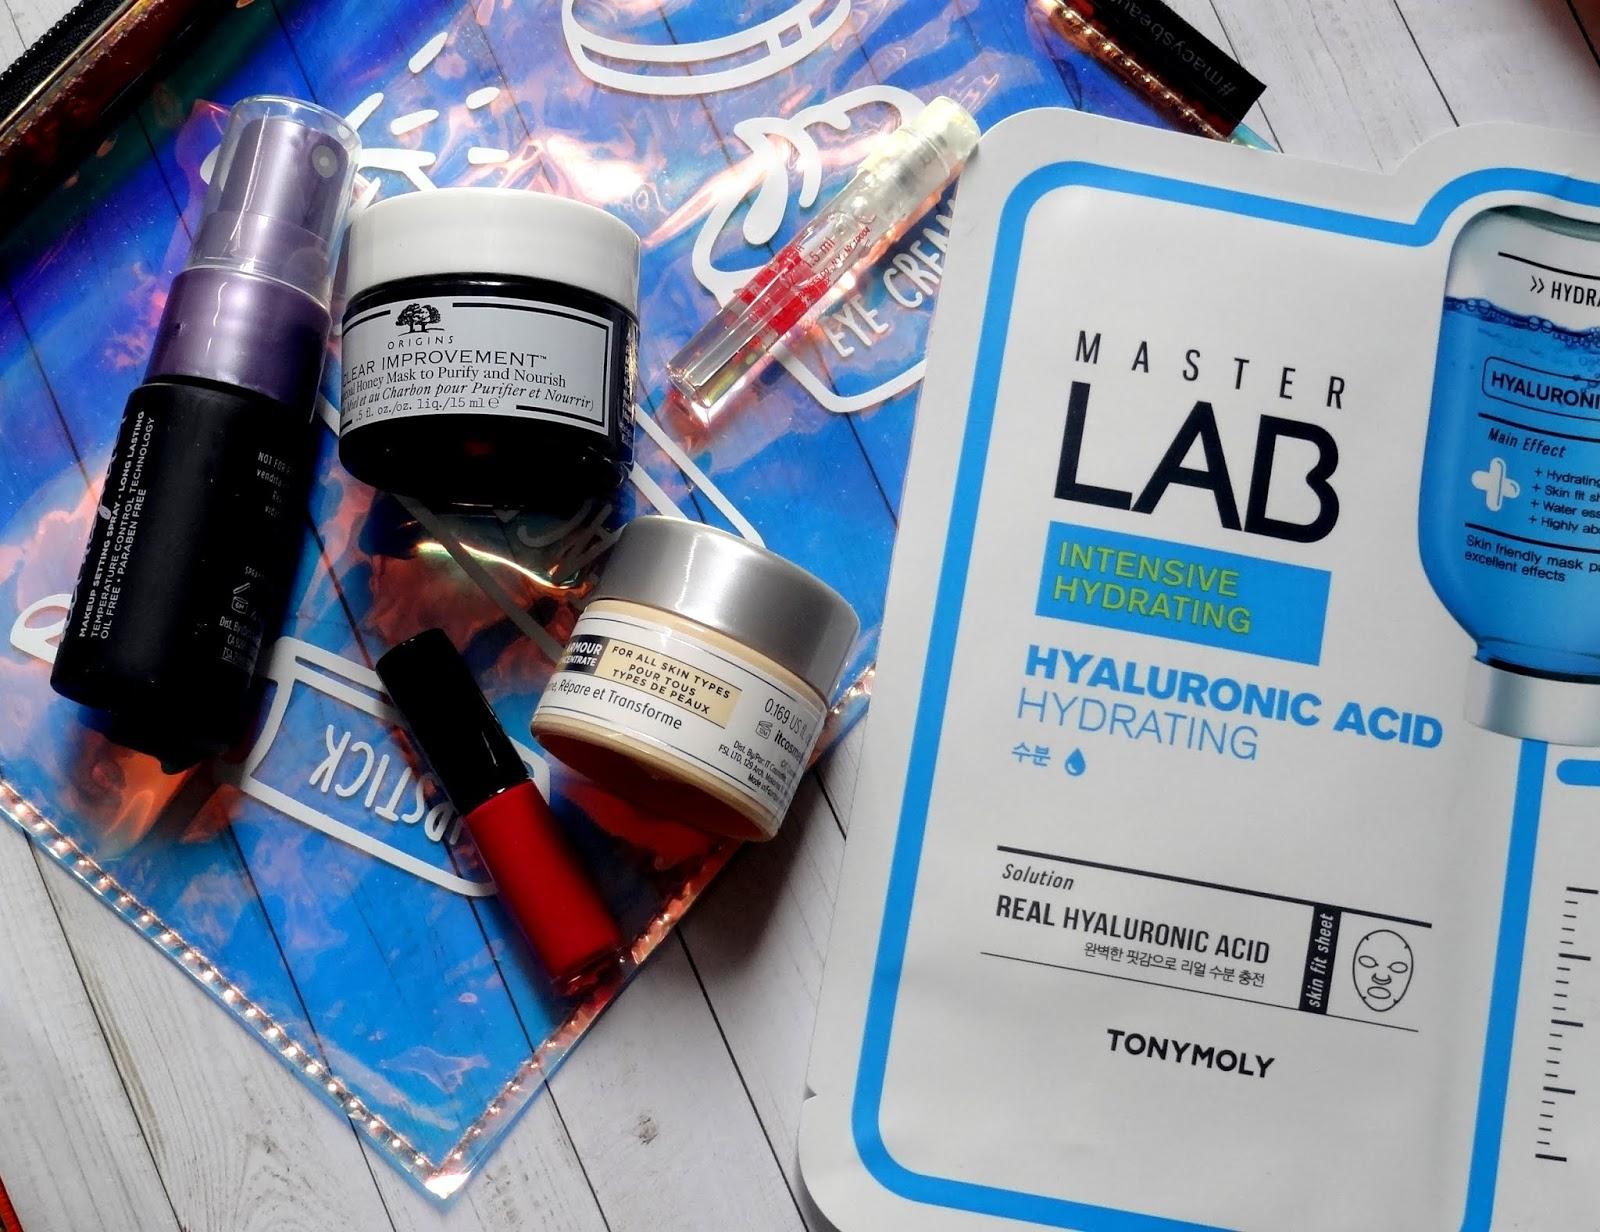 Makeup, Beauty and More: Macy\u2019s August 2018 Beauty Box